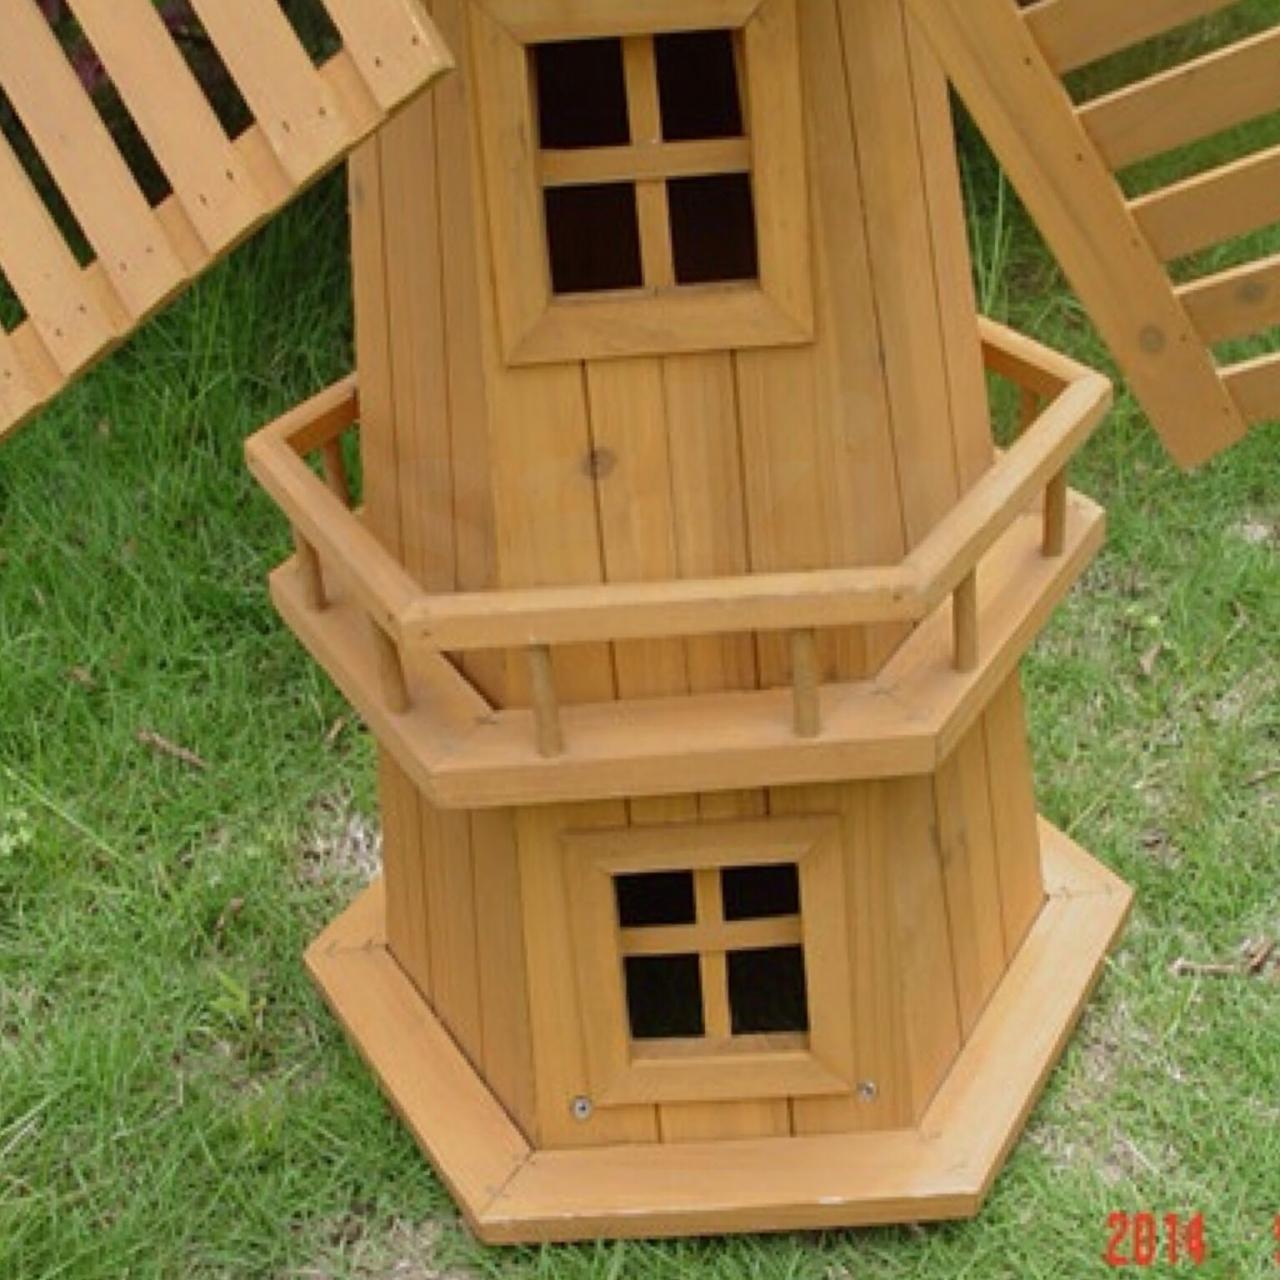 Childrens Craft Make Your Own Wooden Garden Windmill Bird House Paint School New